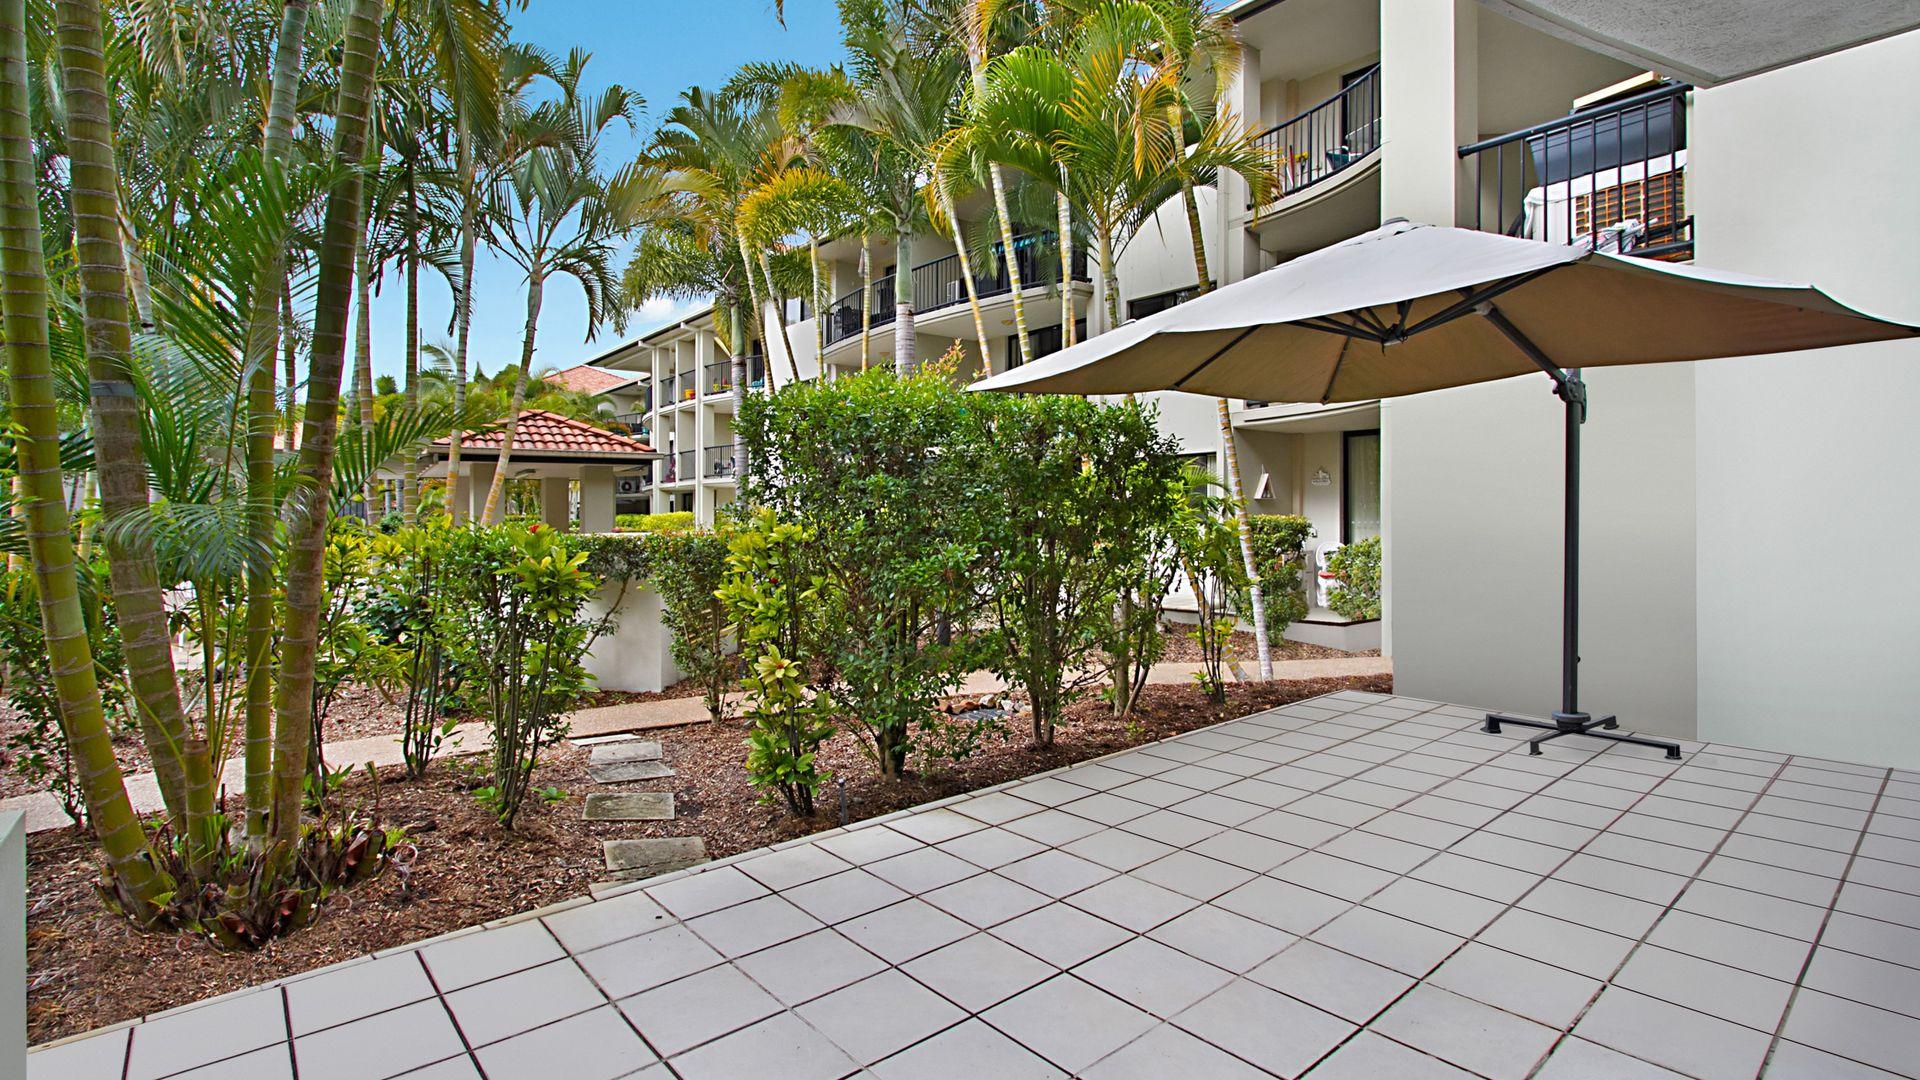 7/14-26 Markeri Street, Mermaid Beach QLD 4218, Image 1